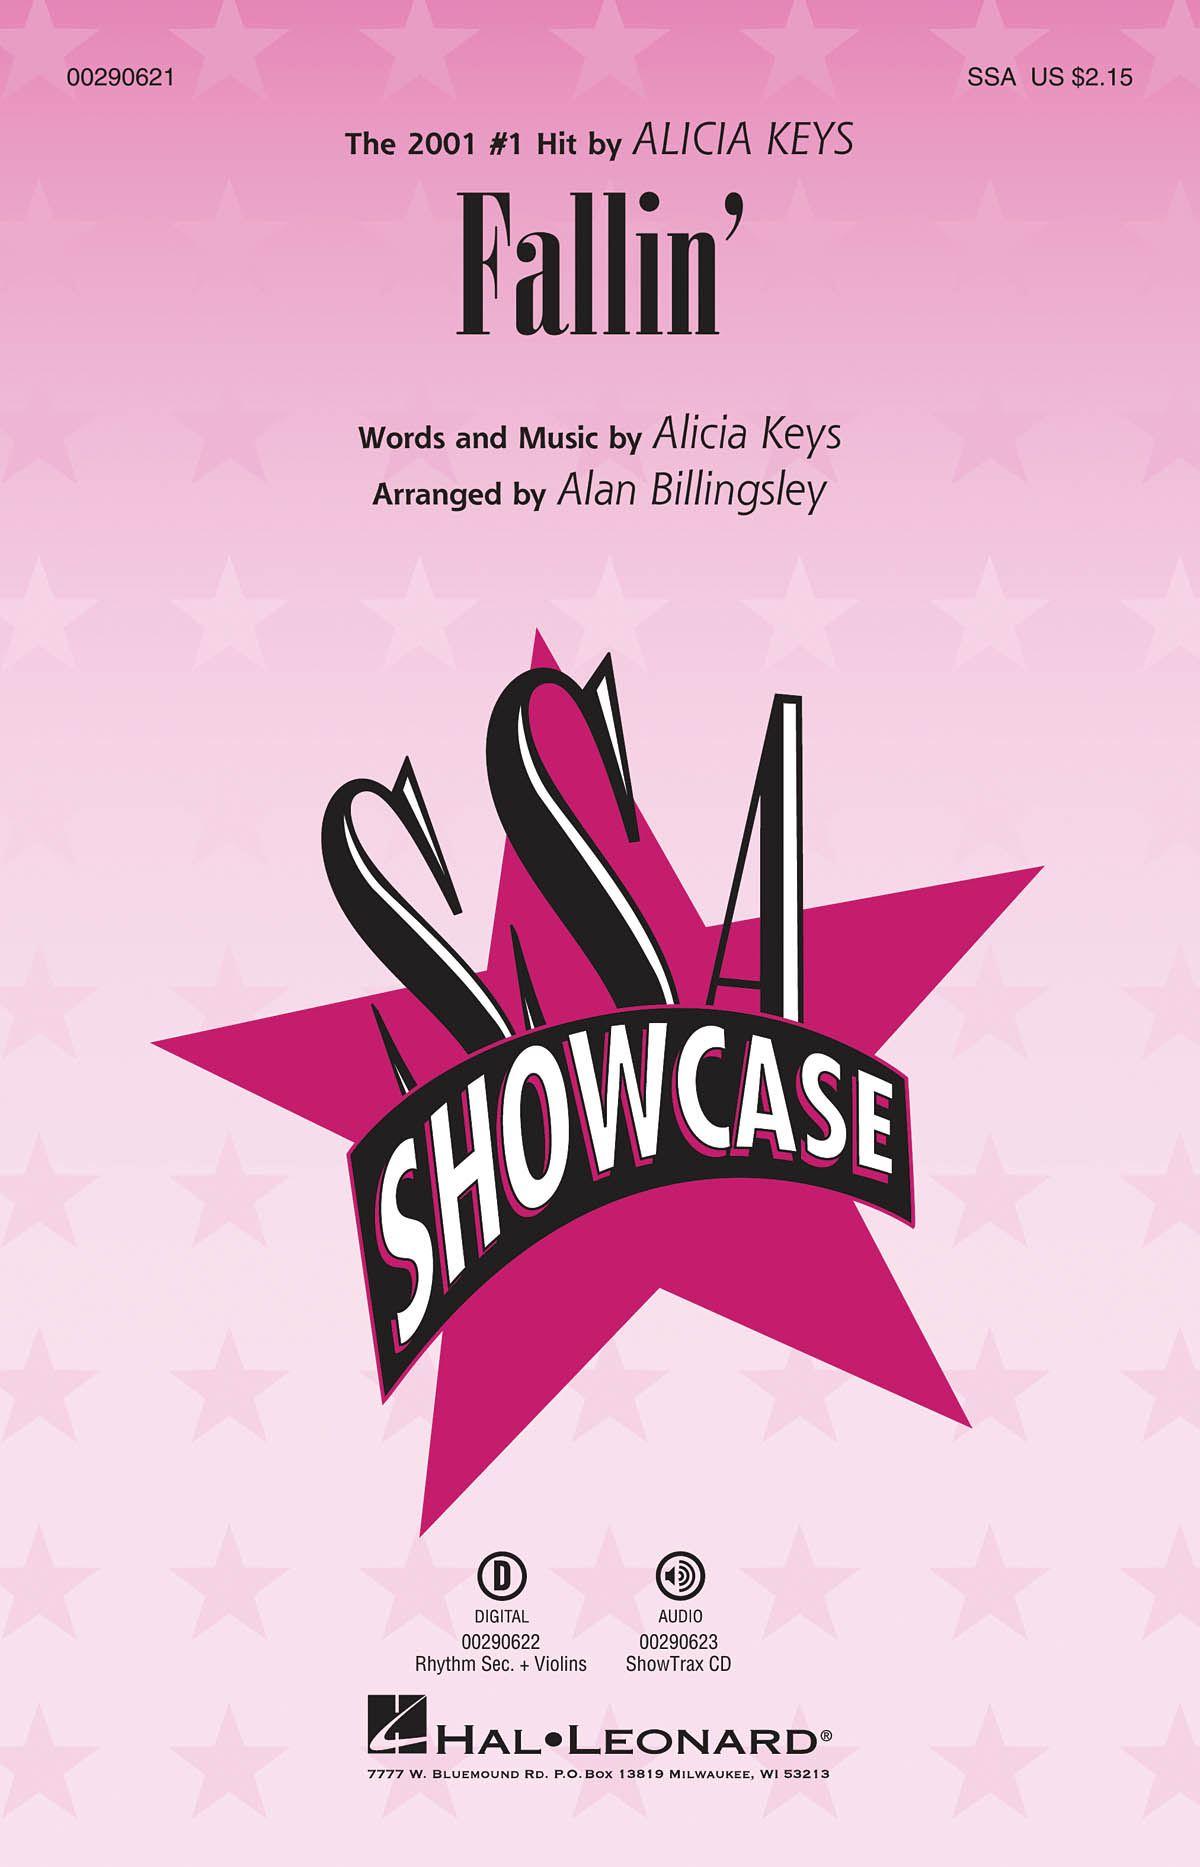 Alicia Keys If I Ain T Got You Audio Download livres de chansons alicia keys - partition alicia keys